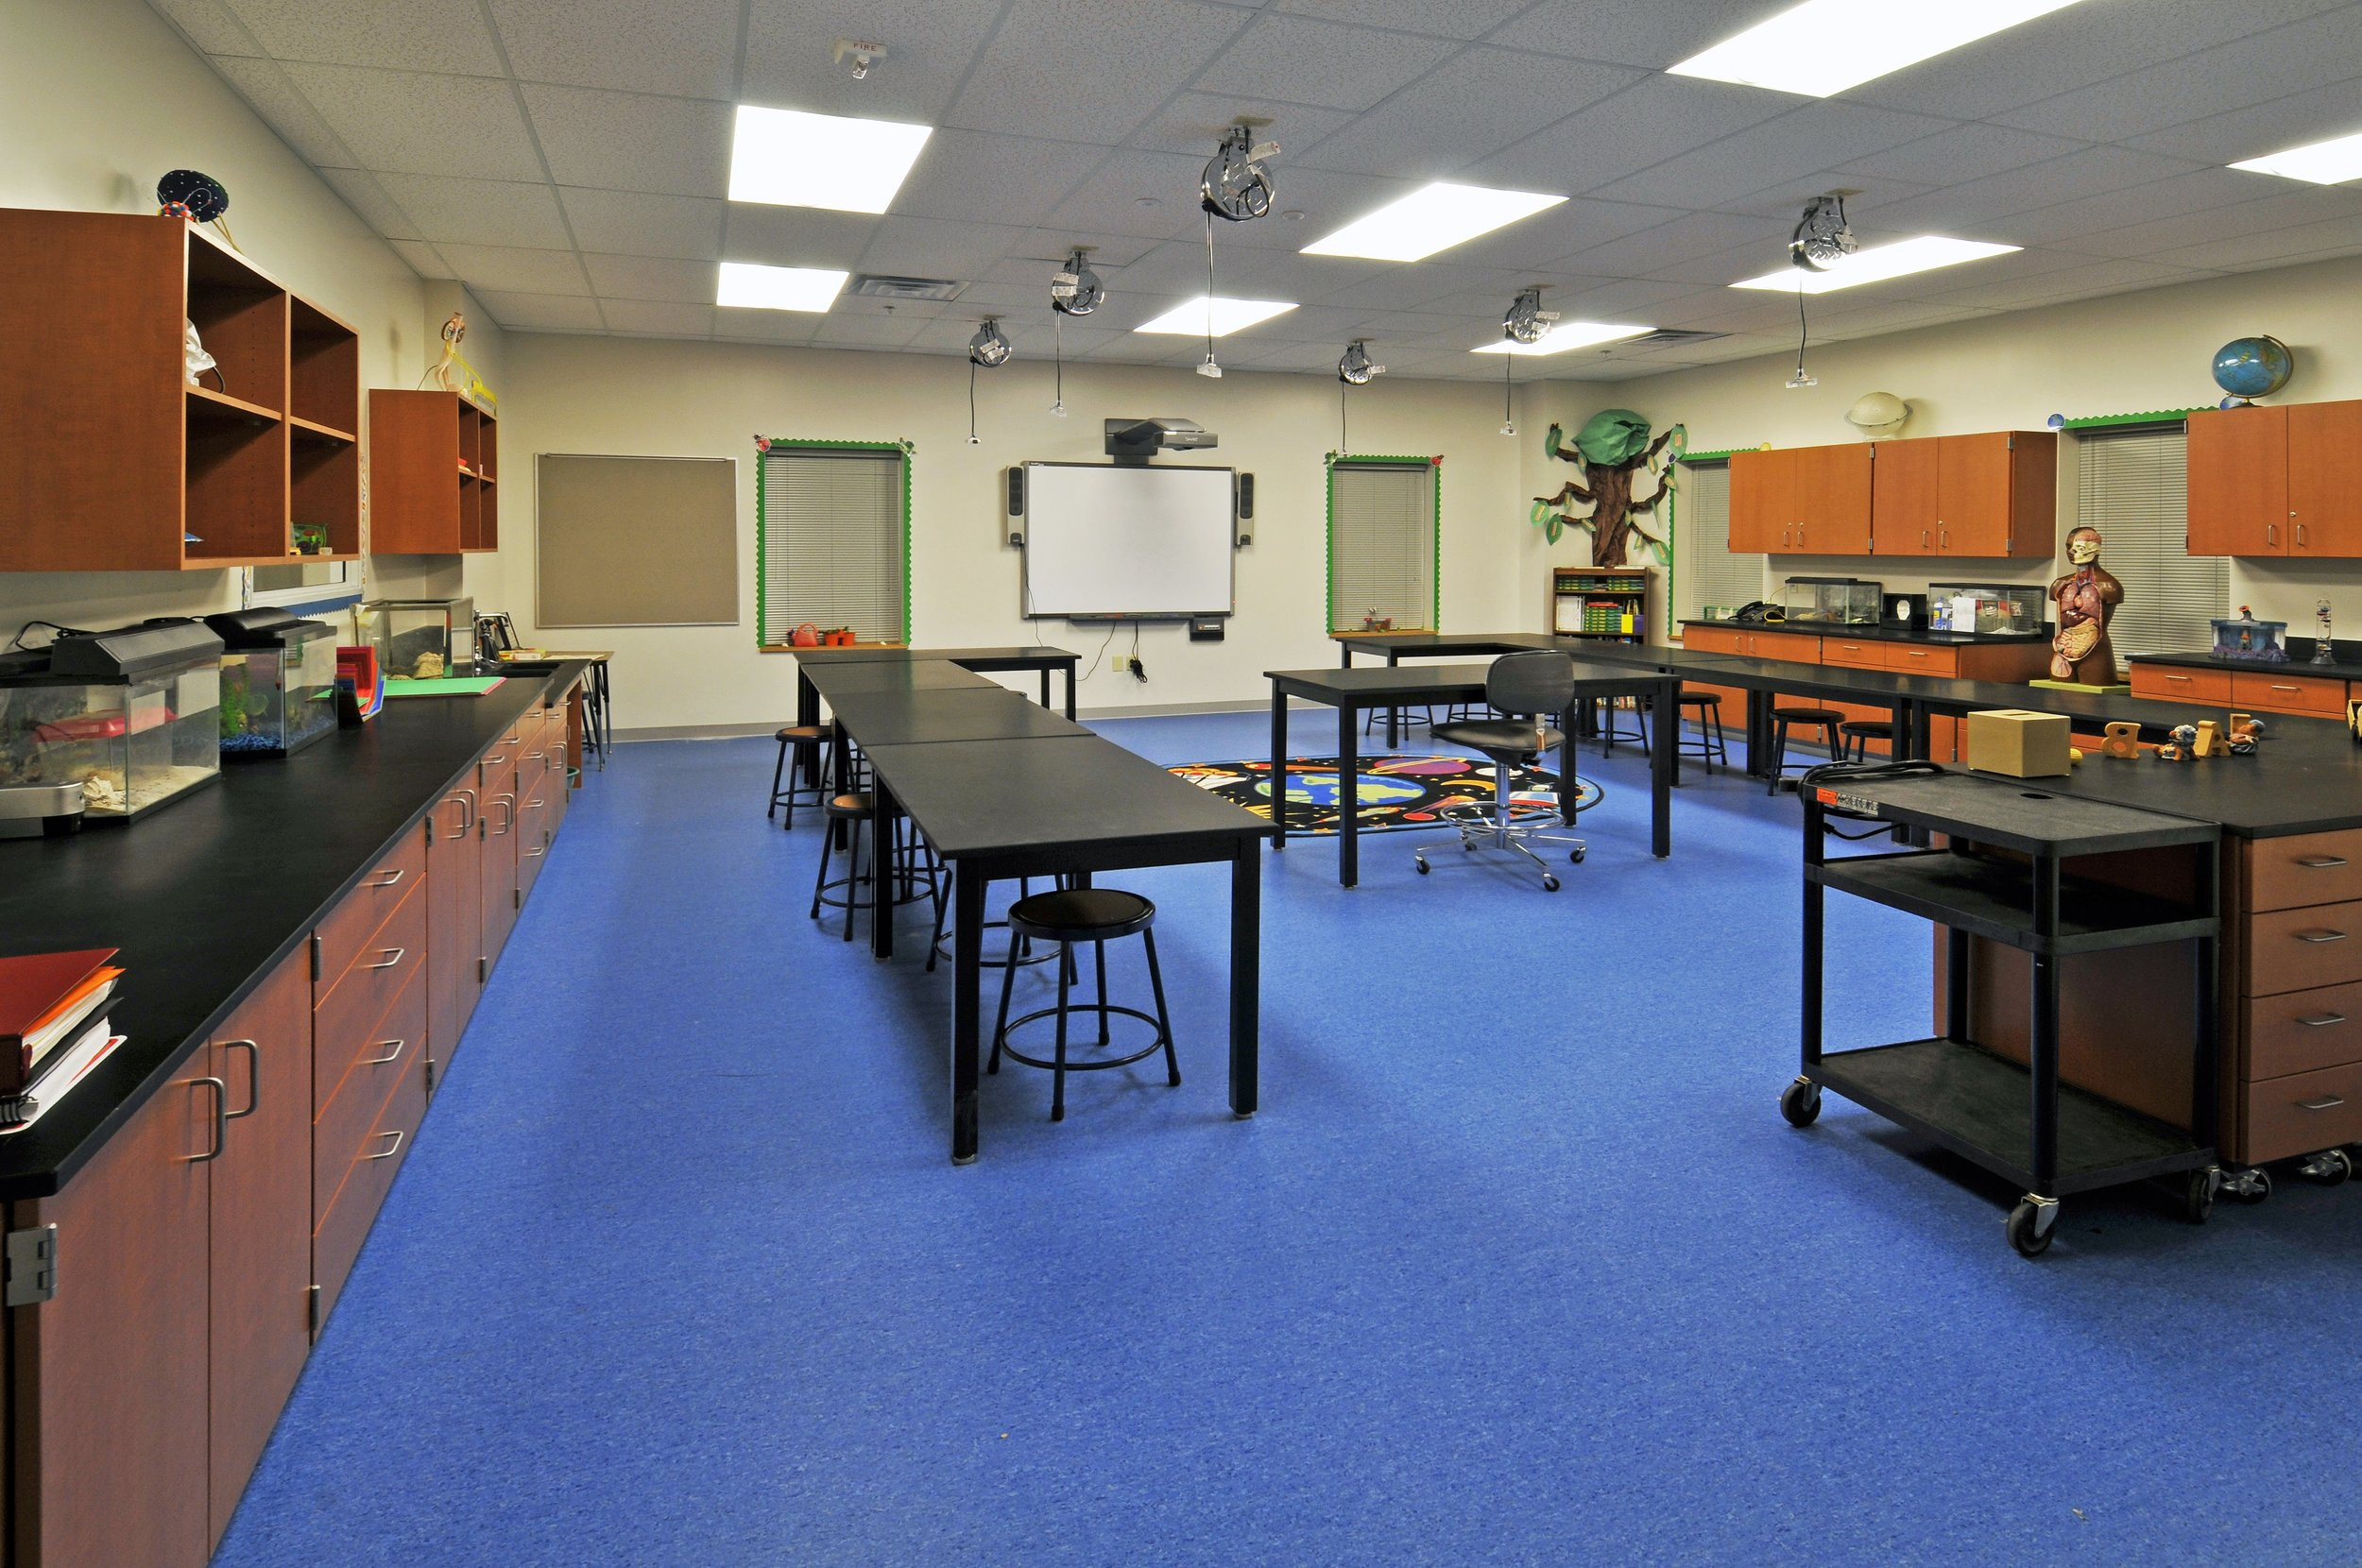 St Philips_Classroom_01.JPG